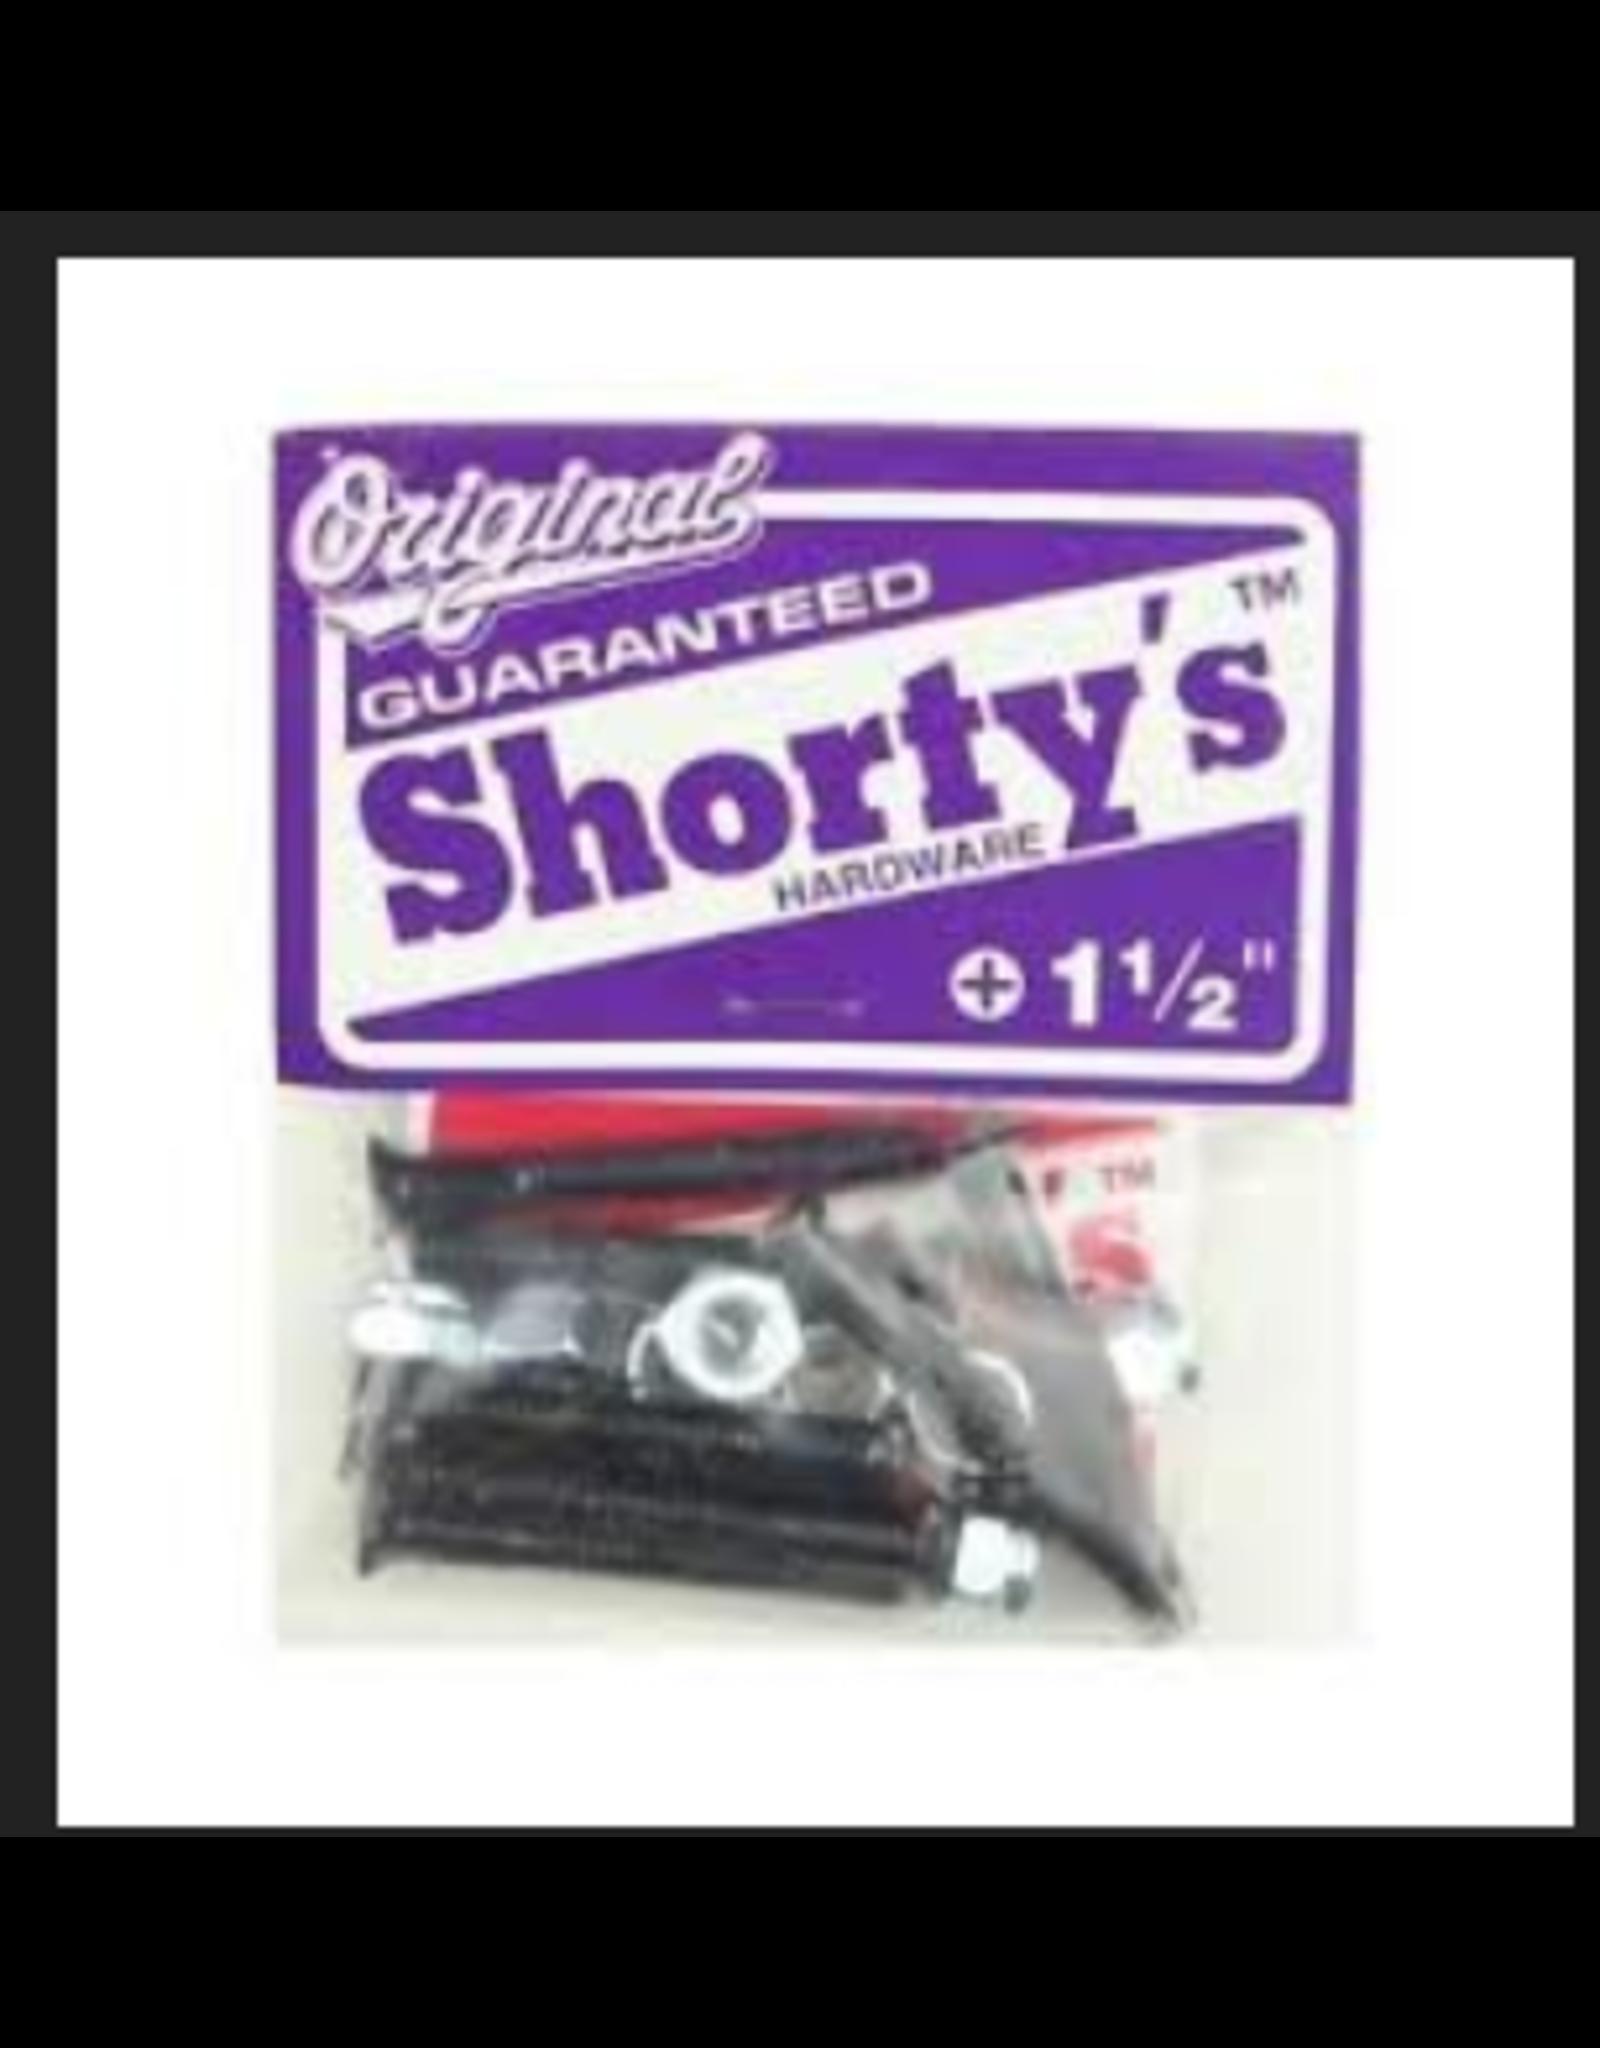 "SHORTYS 1-1/2""  PHILLIPS HARDWARE Product SKU 1ASHOPHB1015000"